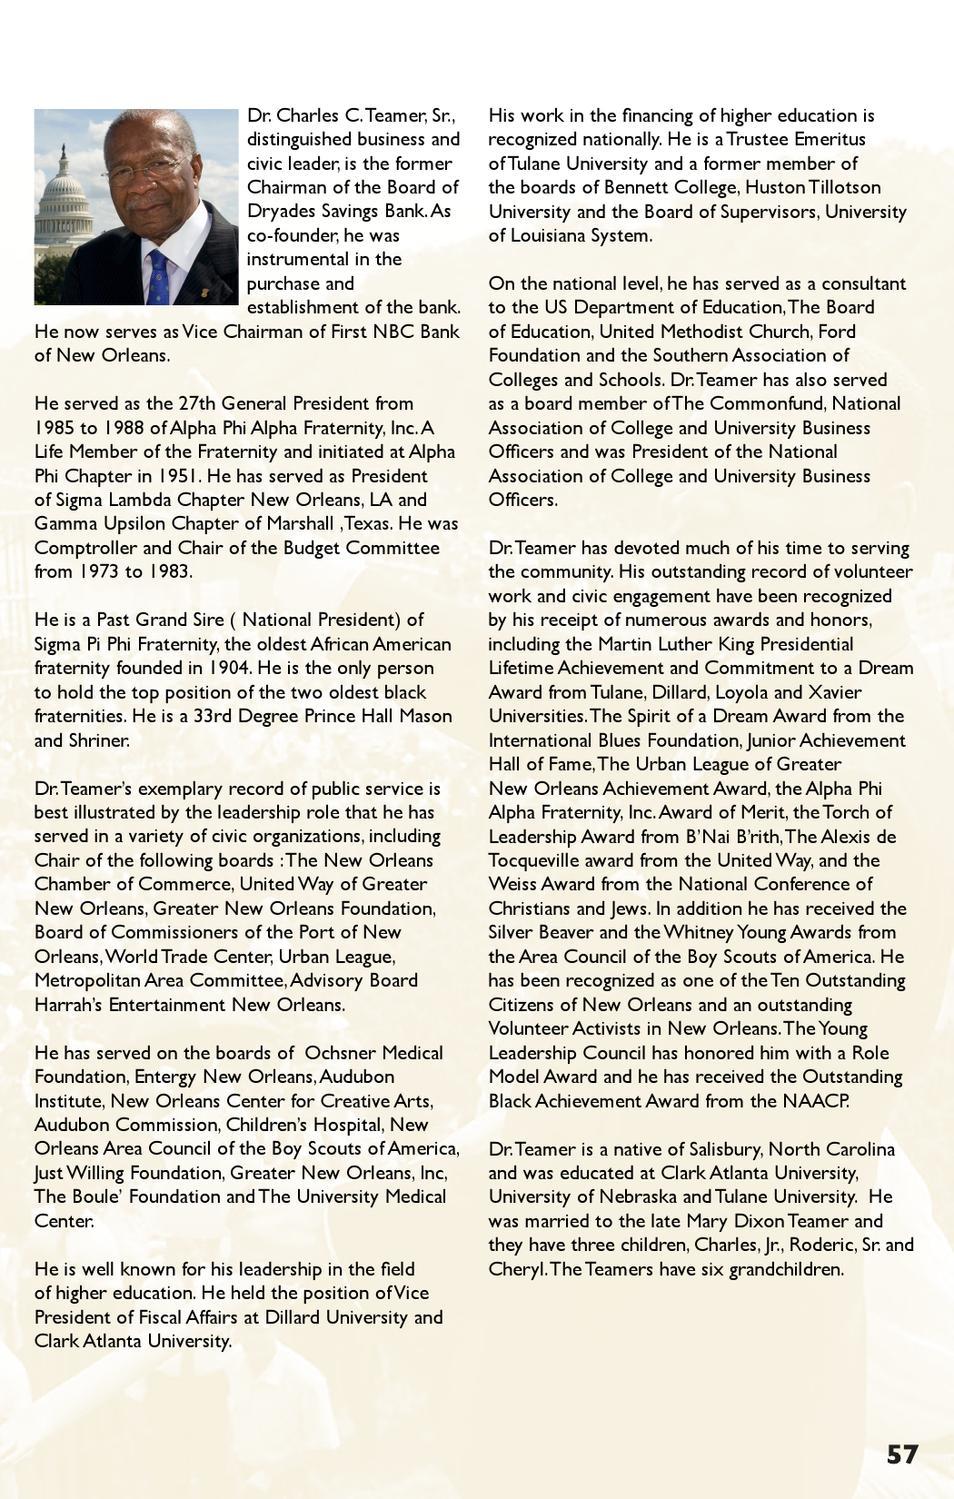 MLK Memorial Dedication Souvenir Journal by Alpha Phi Alpha